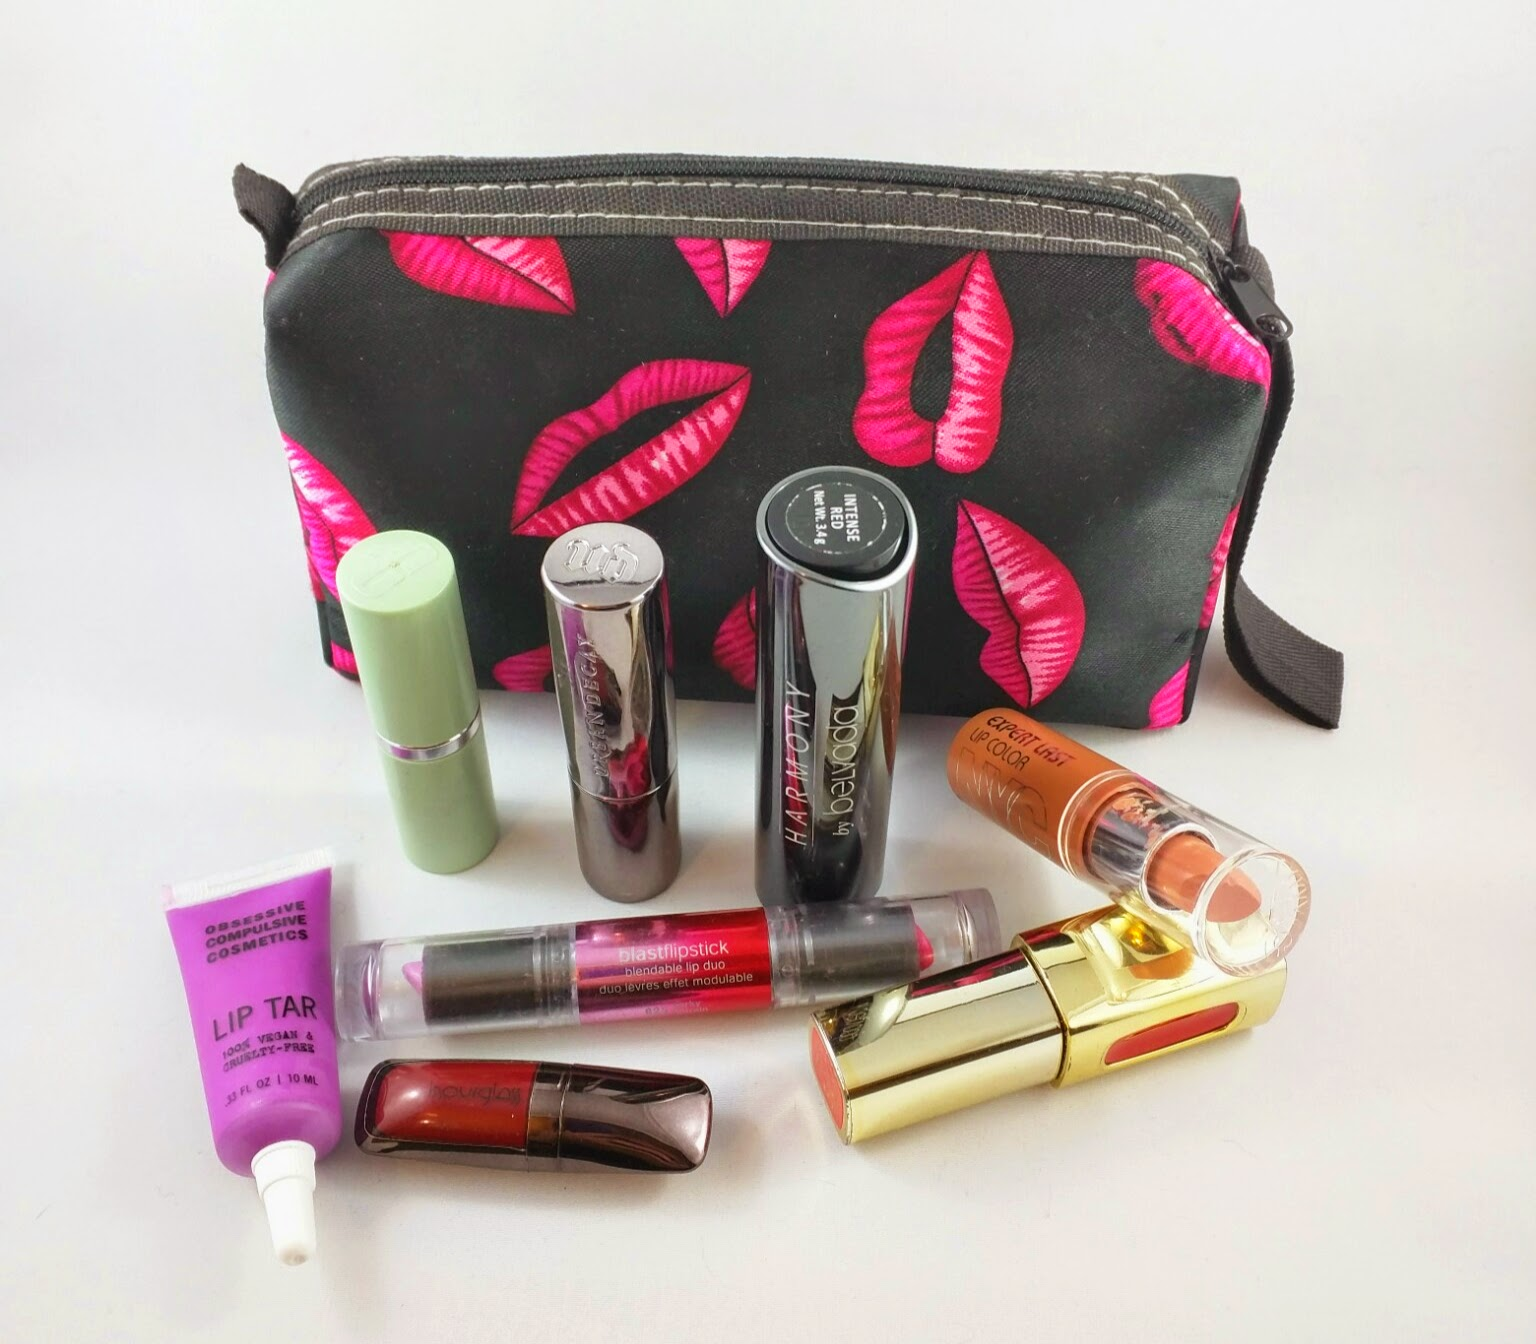 April Lipstick Challenge - Random bag!